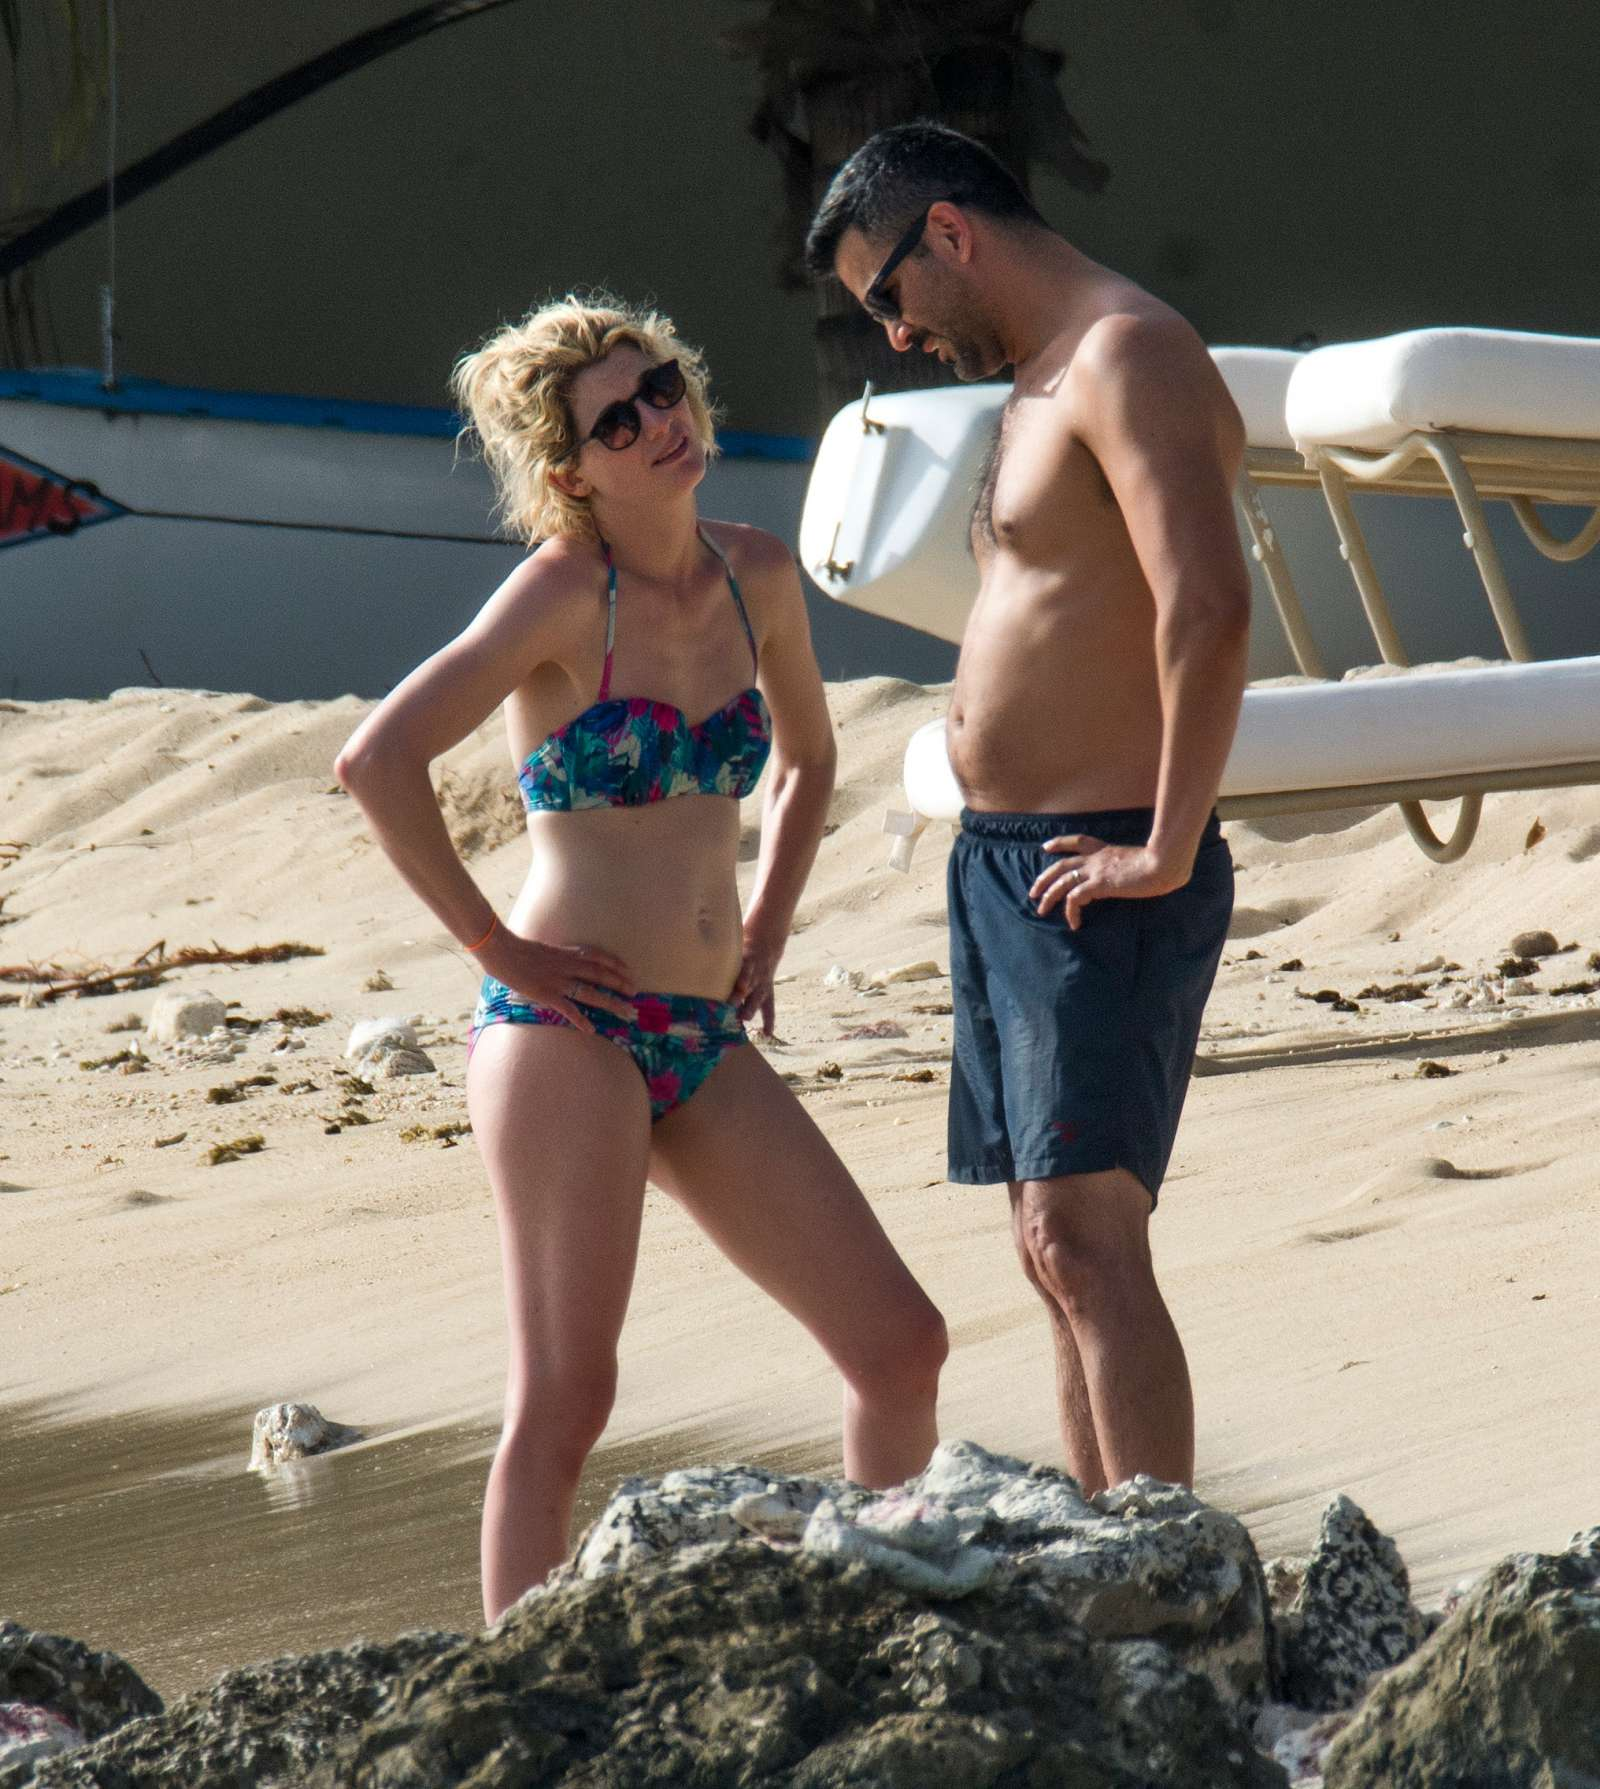 Bikini Jodie Whittaker nude (11 photo), Topless, Cleavage, Feet, legs 2015